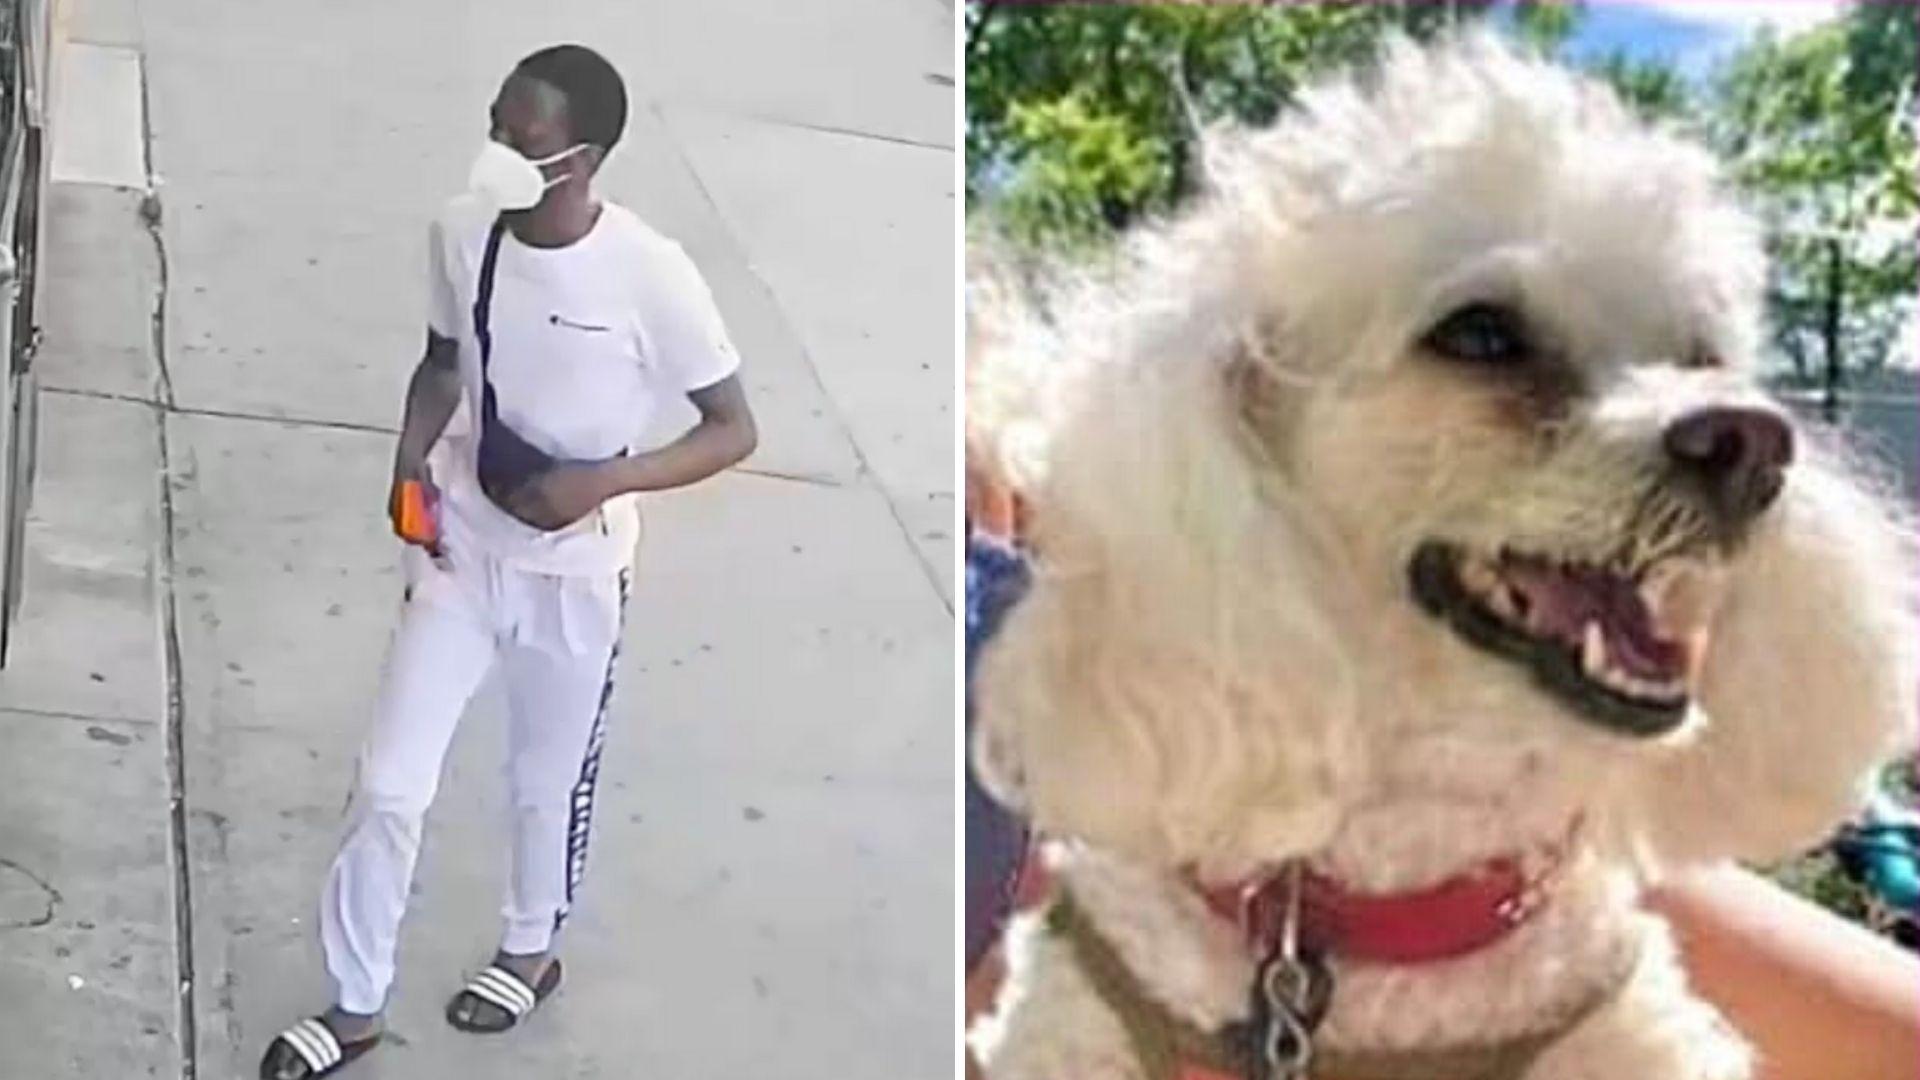 Brooklyn carjacking suspect; dog stolen